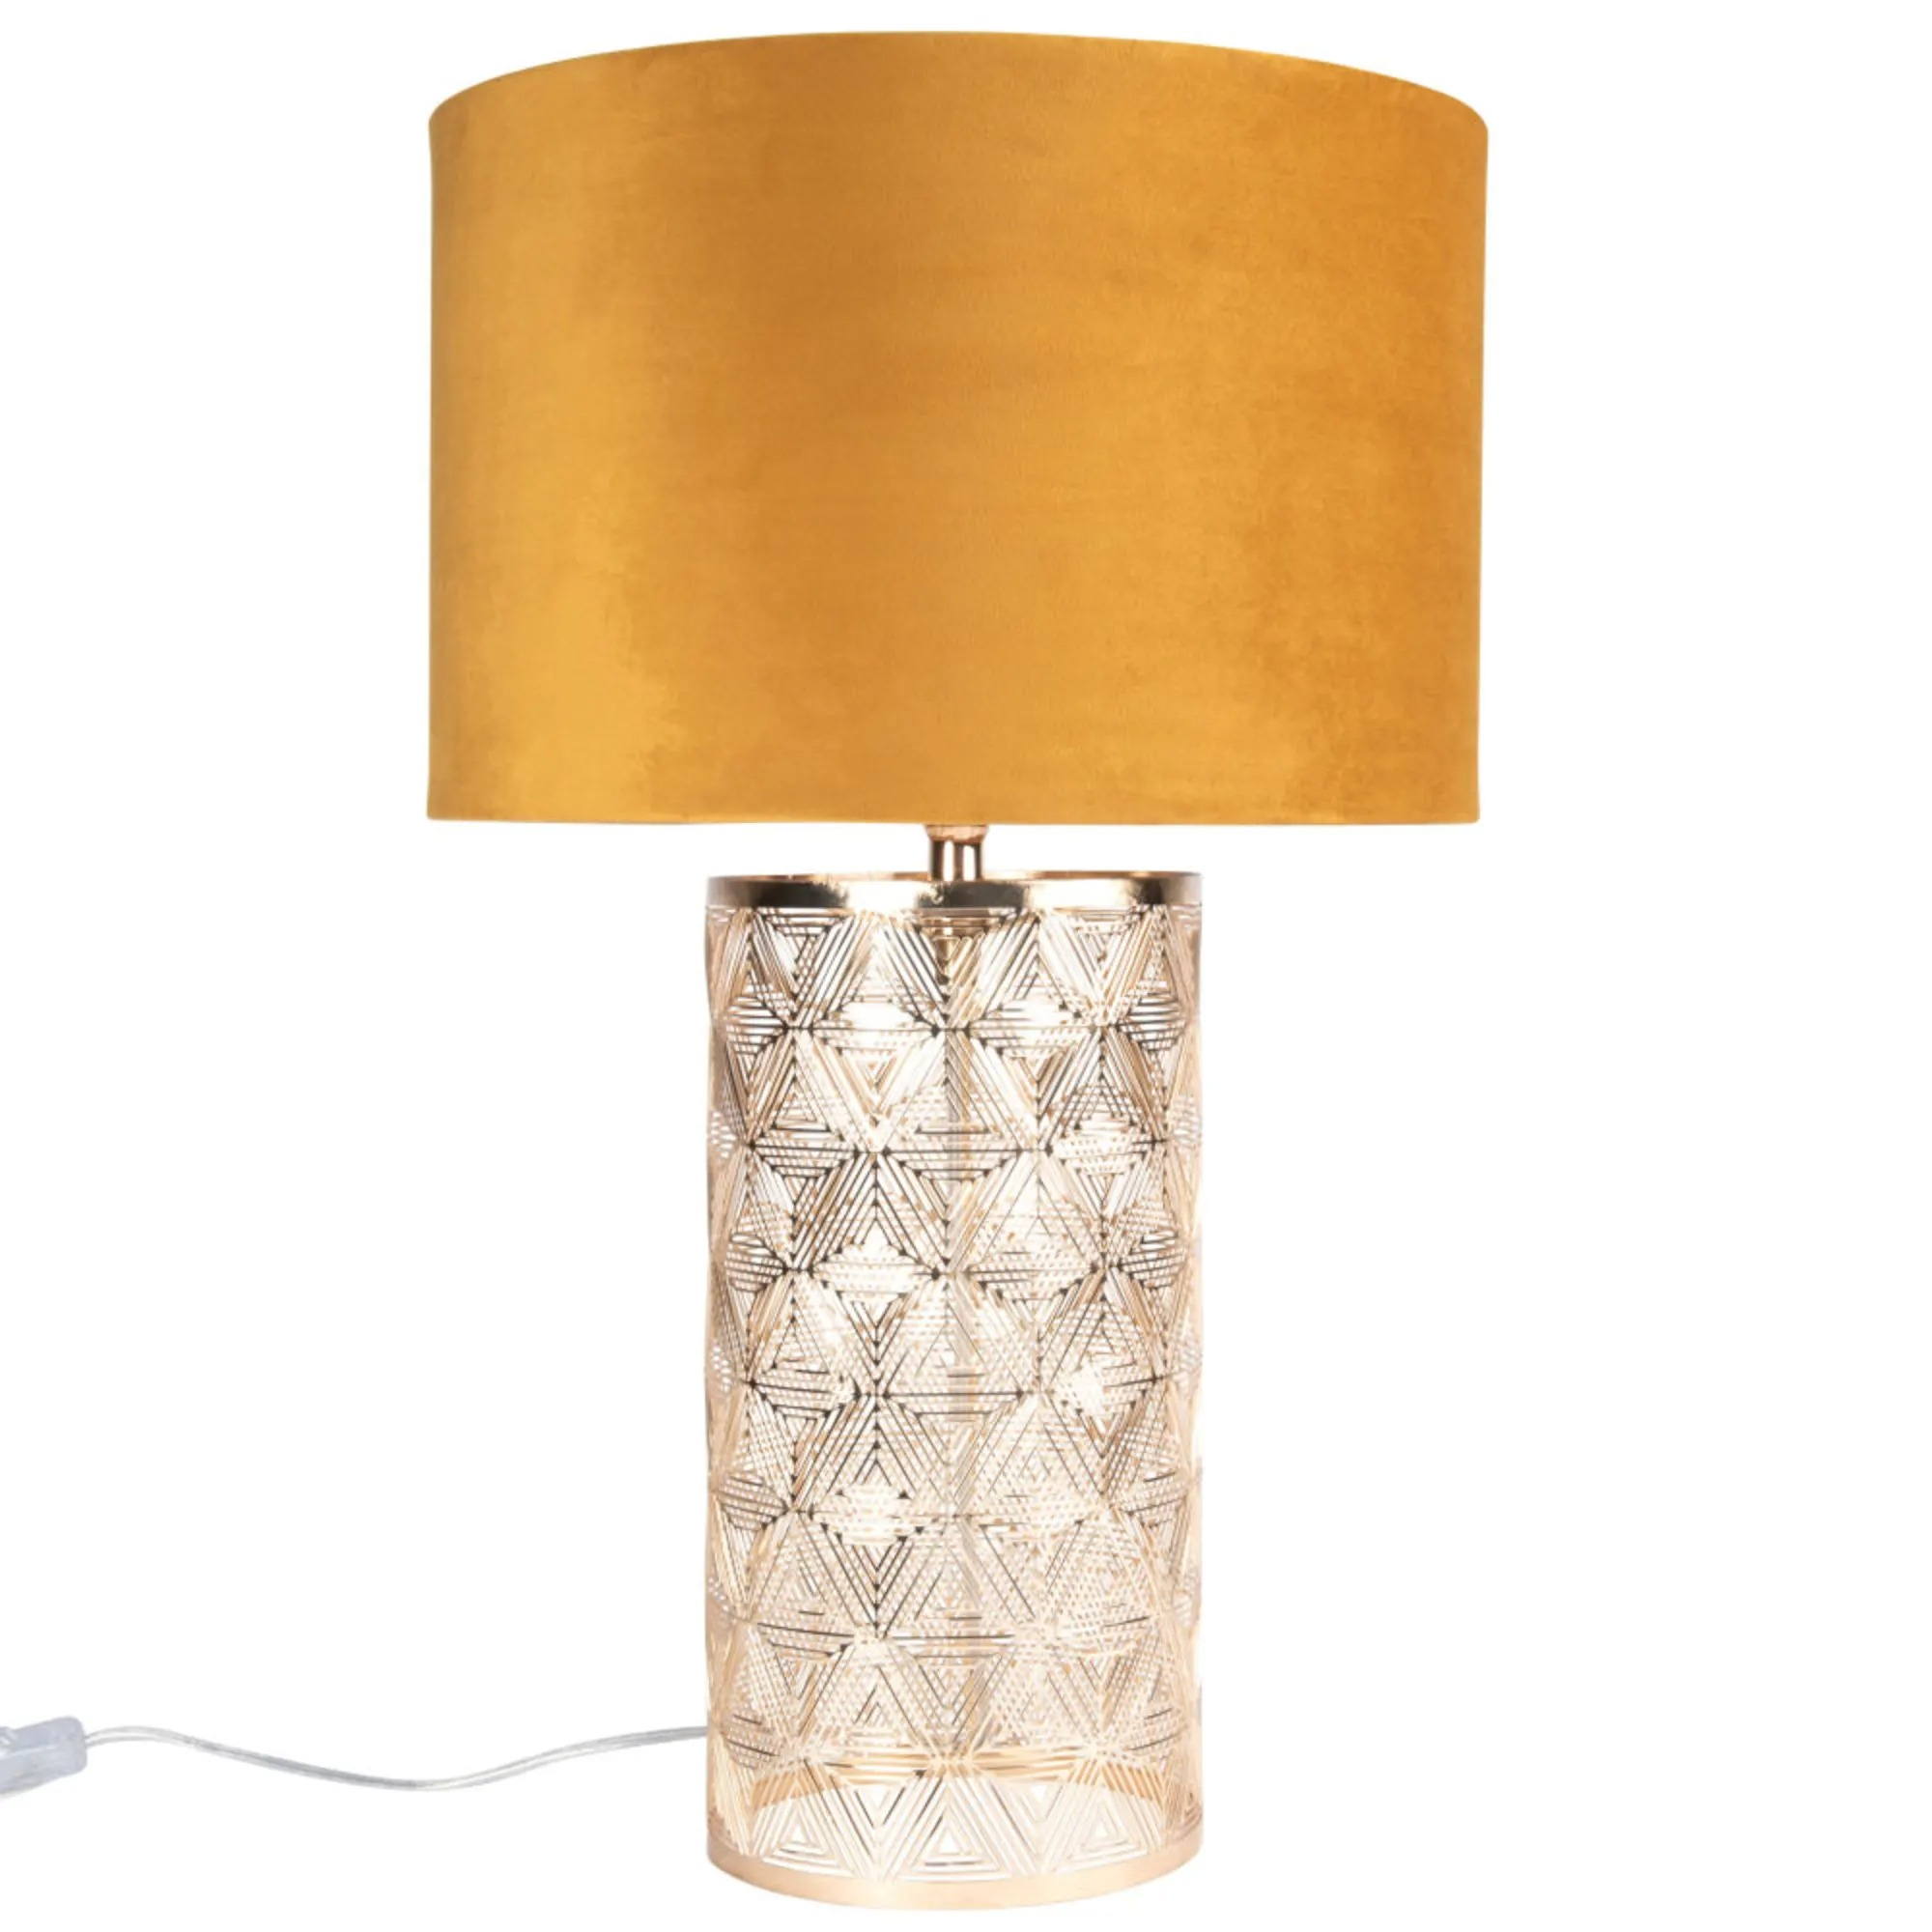 Lámpara de metal dorado con pantalla de terciopelo amarillo.